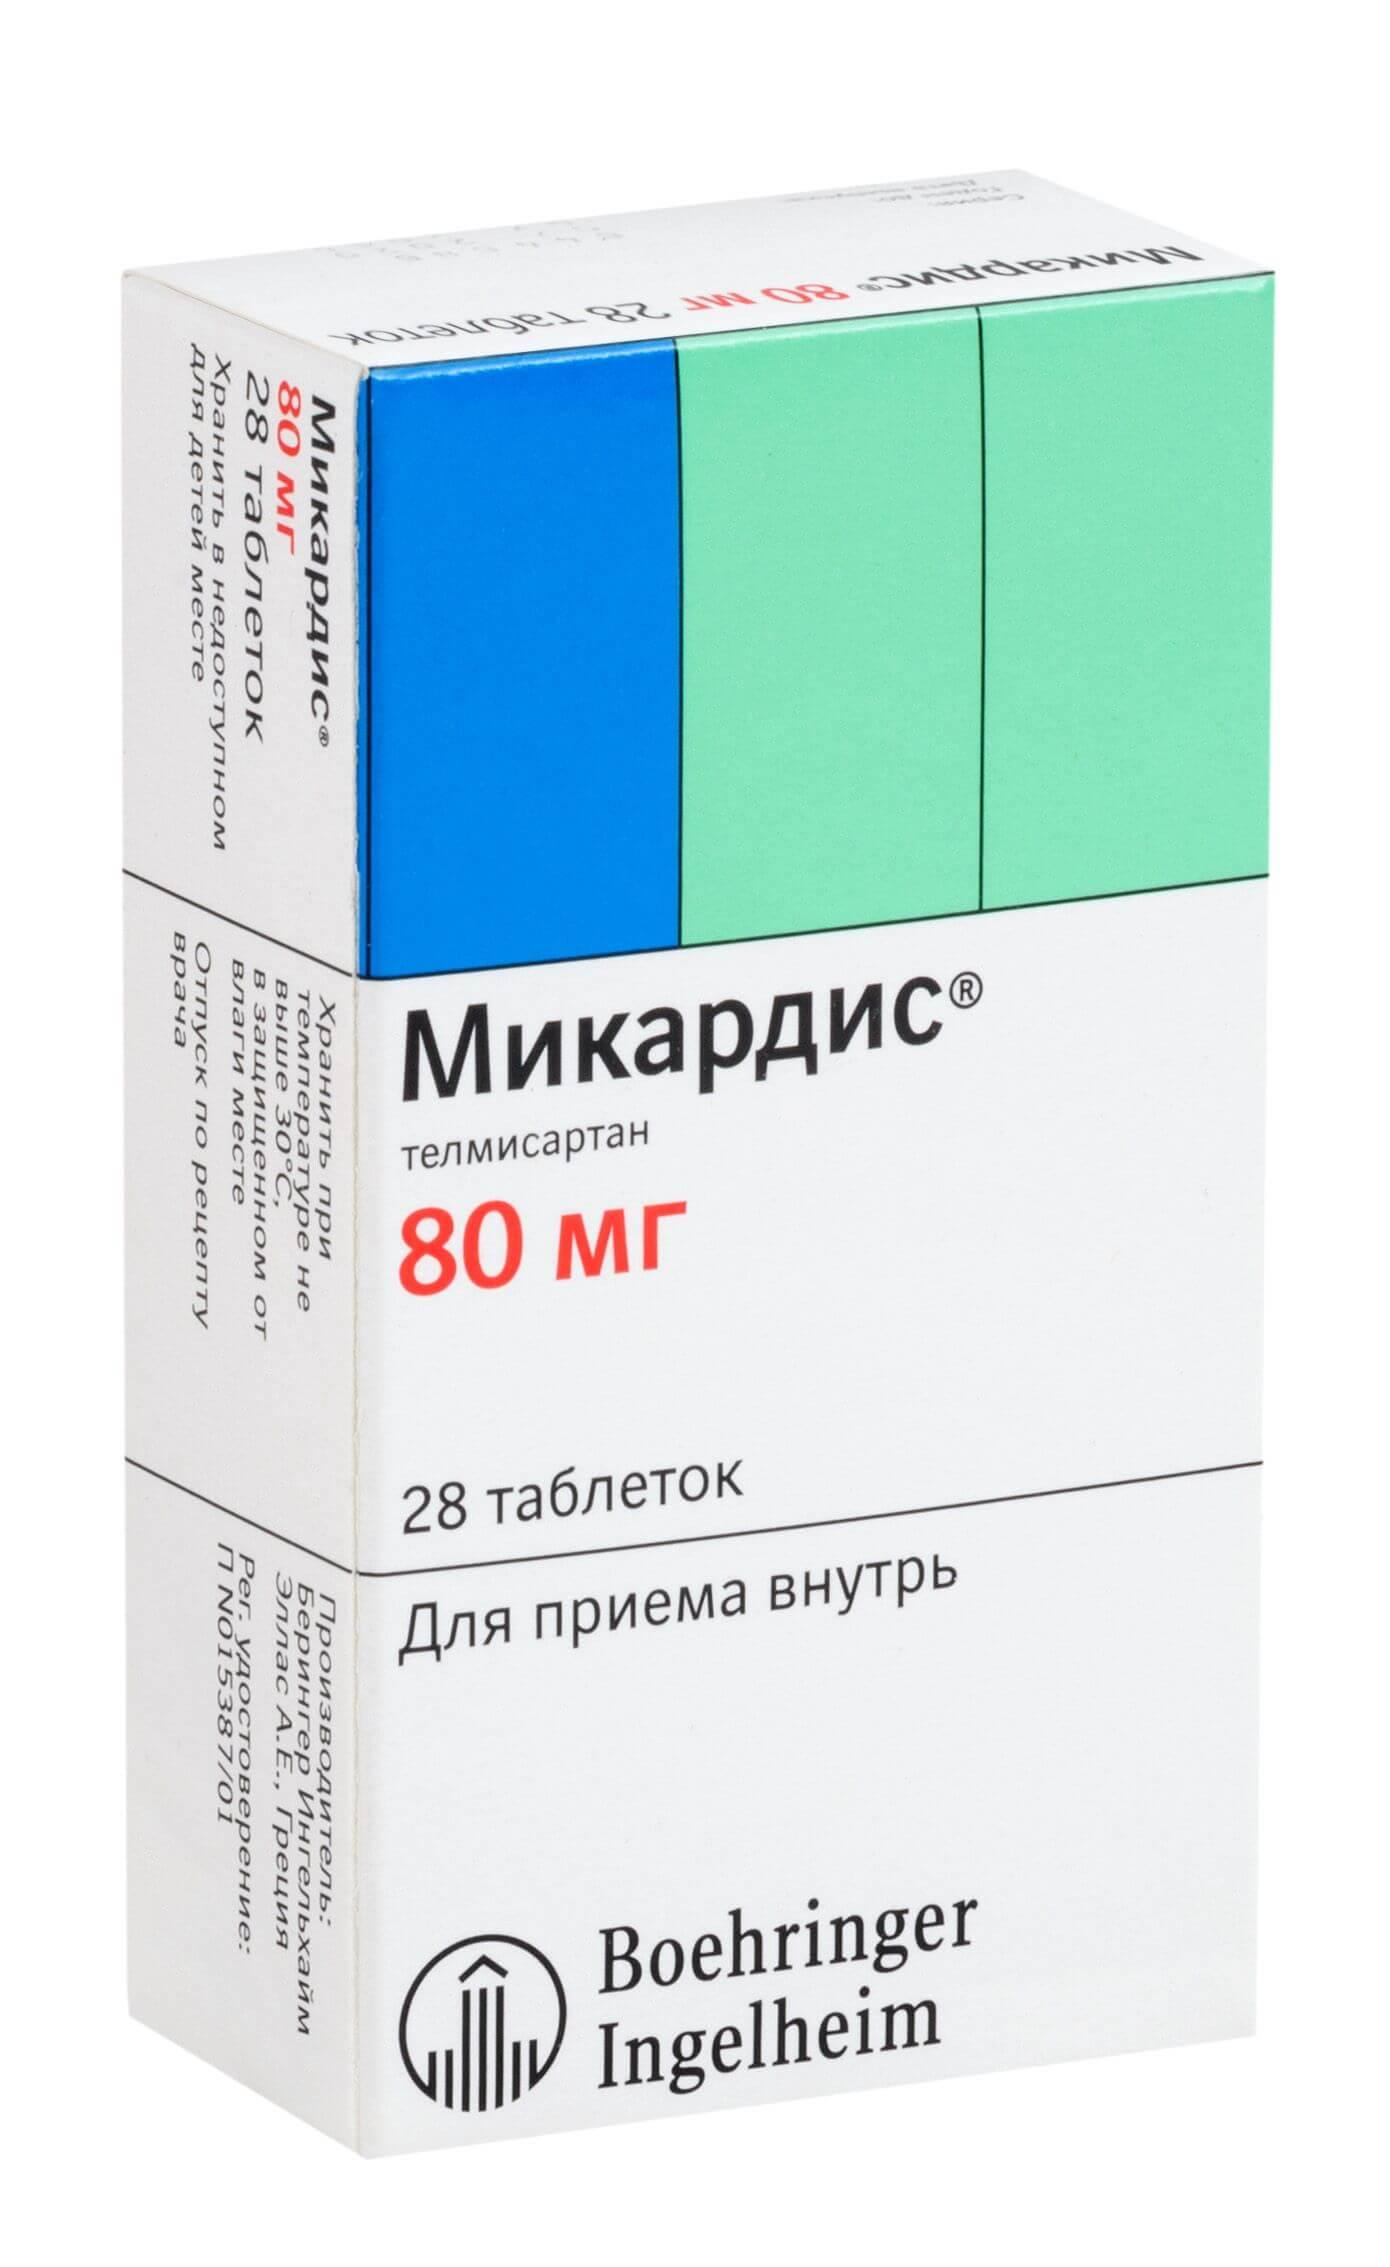 Микардис: инструкция по применению таблеток